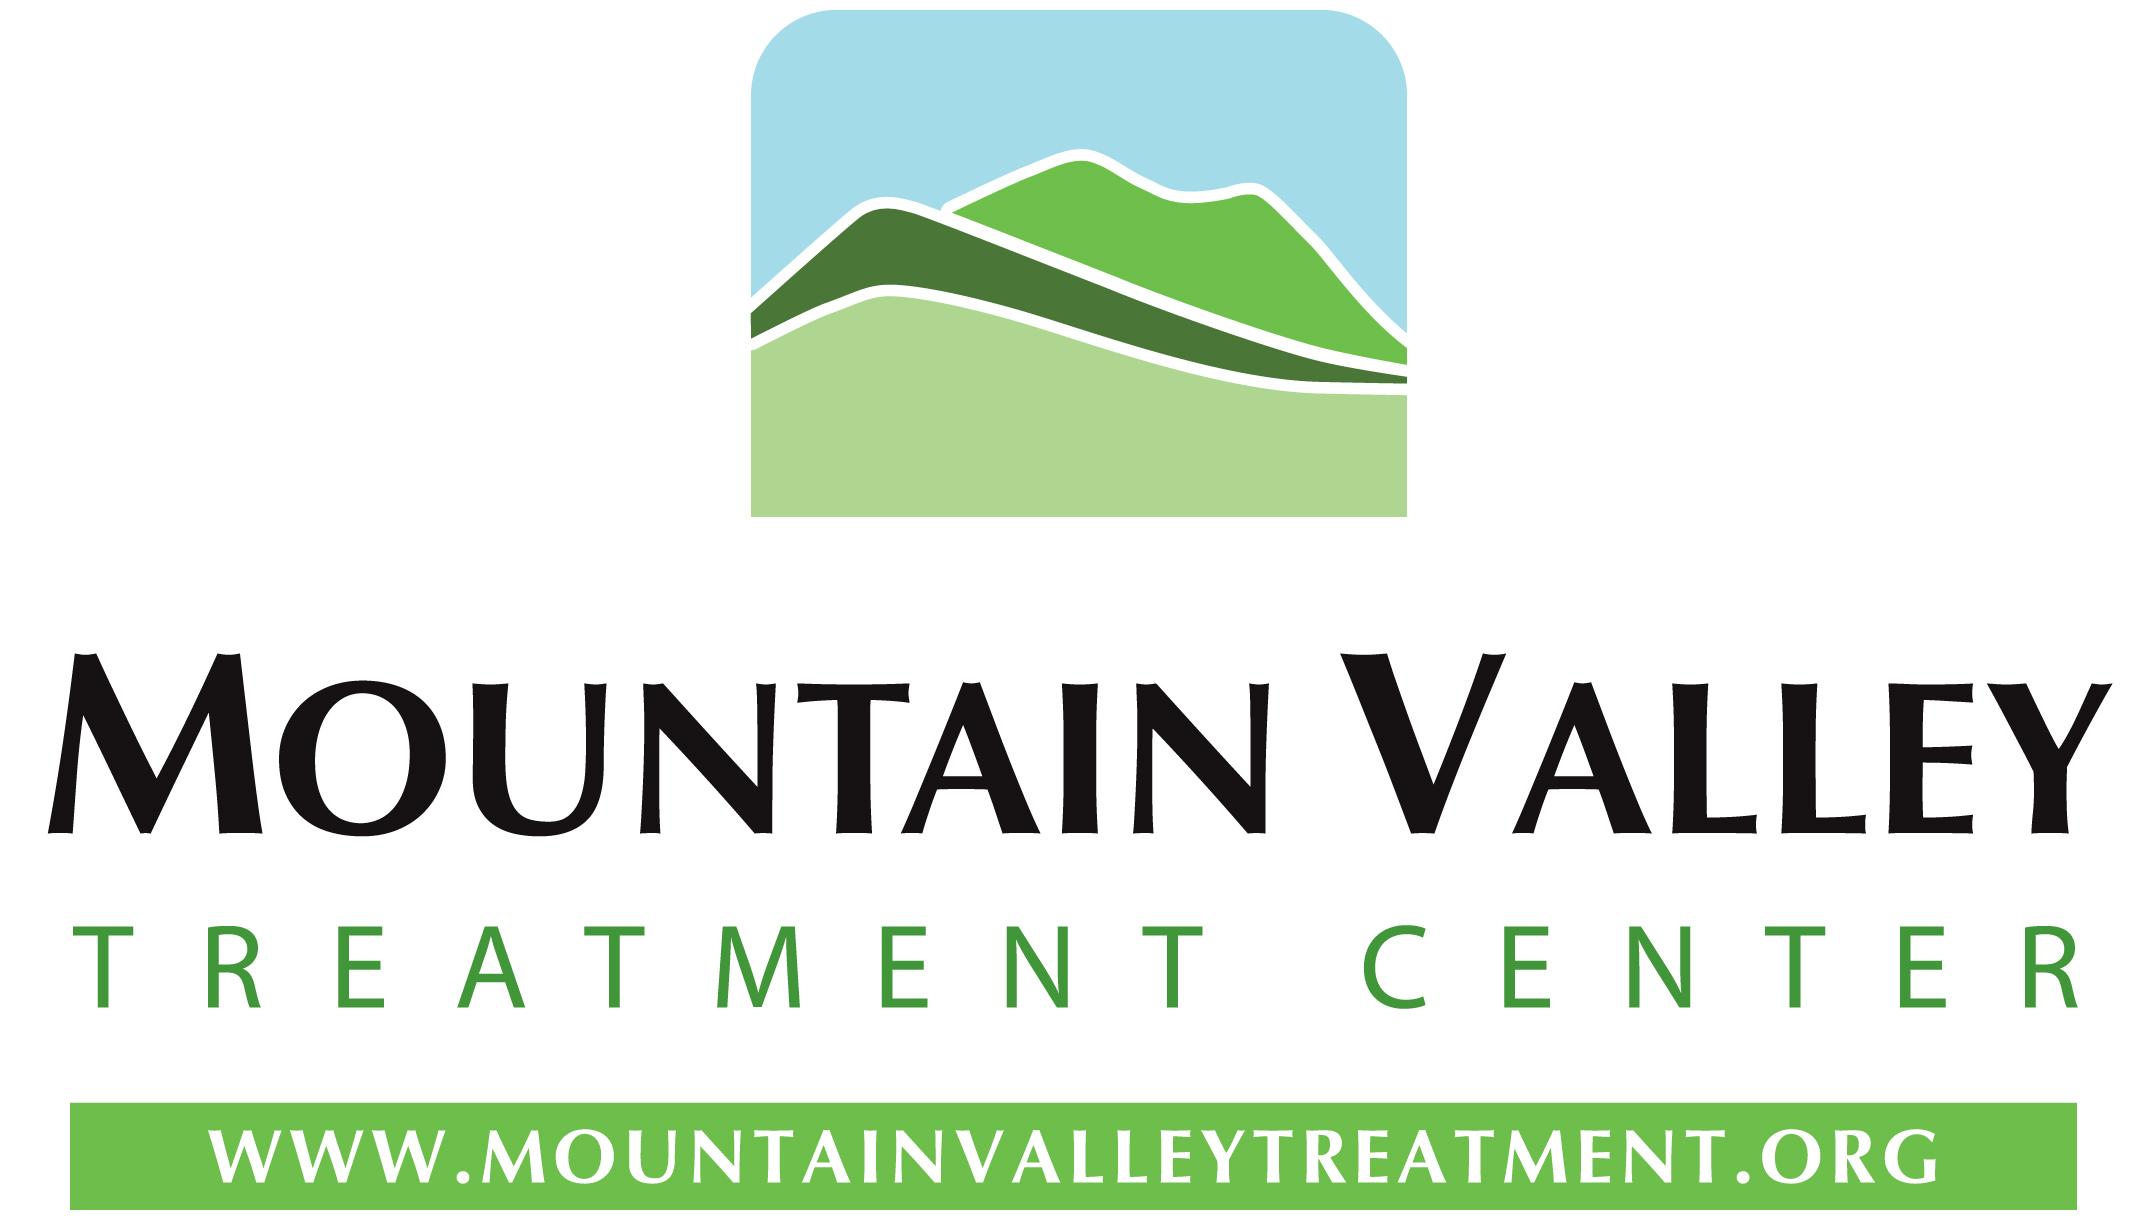 MountainValleyVertLogo.jpg